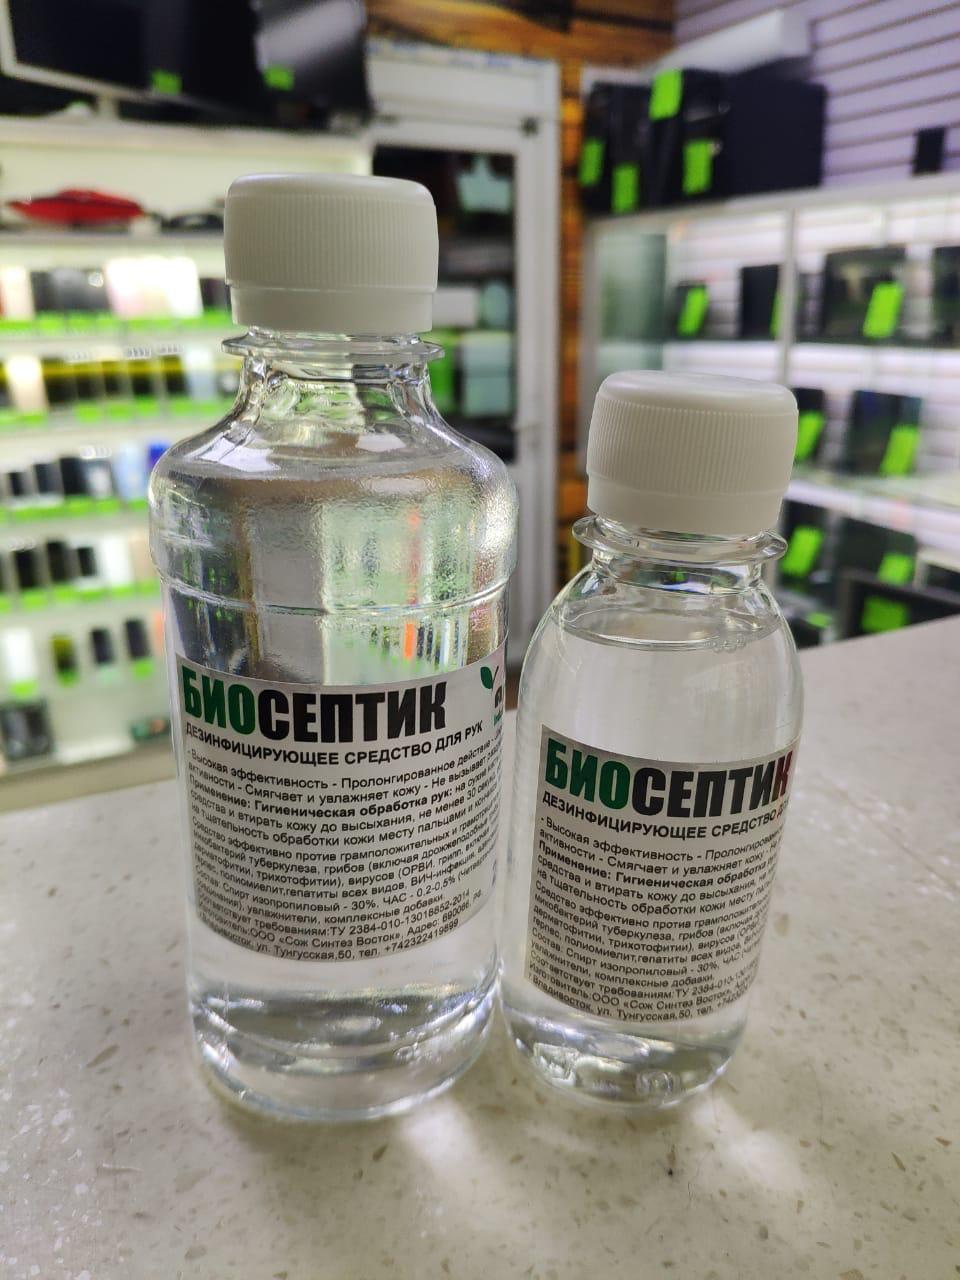 Bioseptic - hand sanitizer